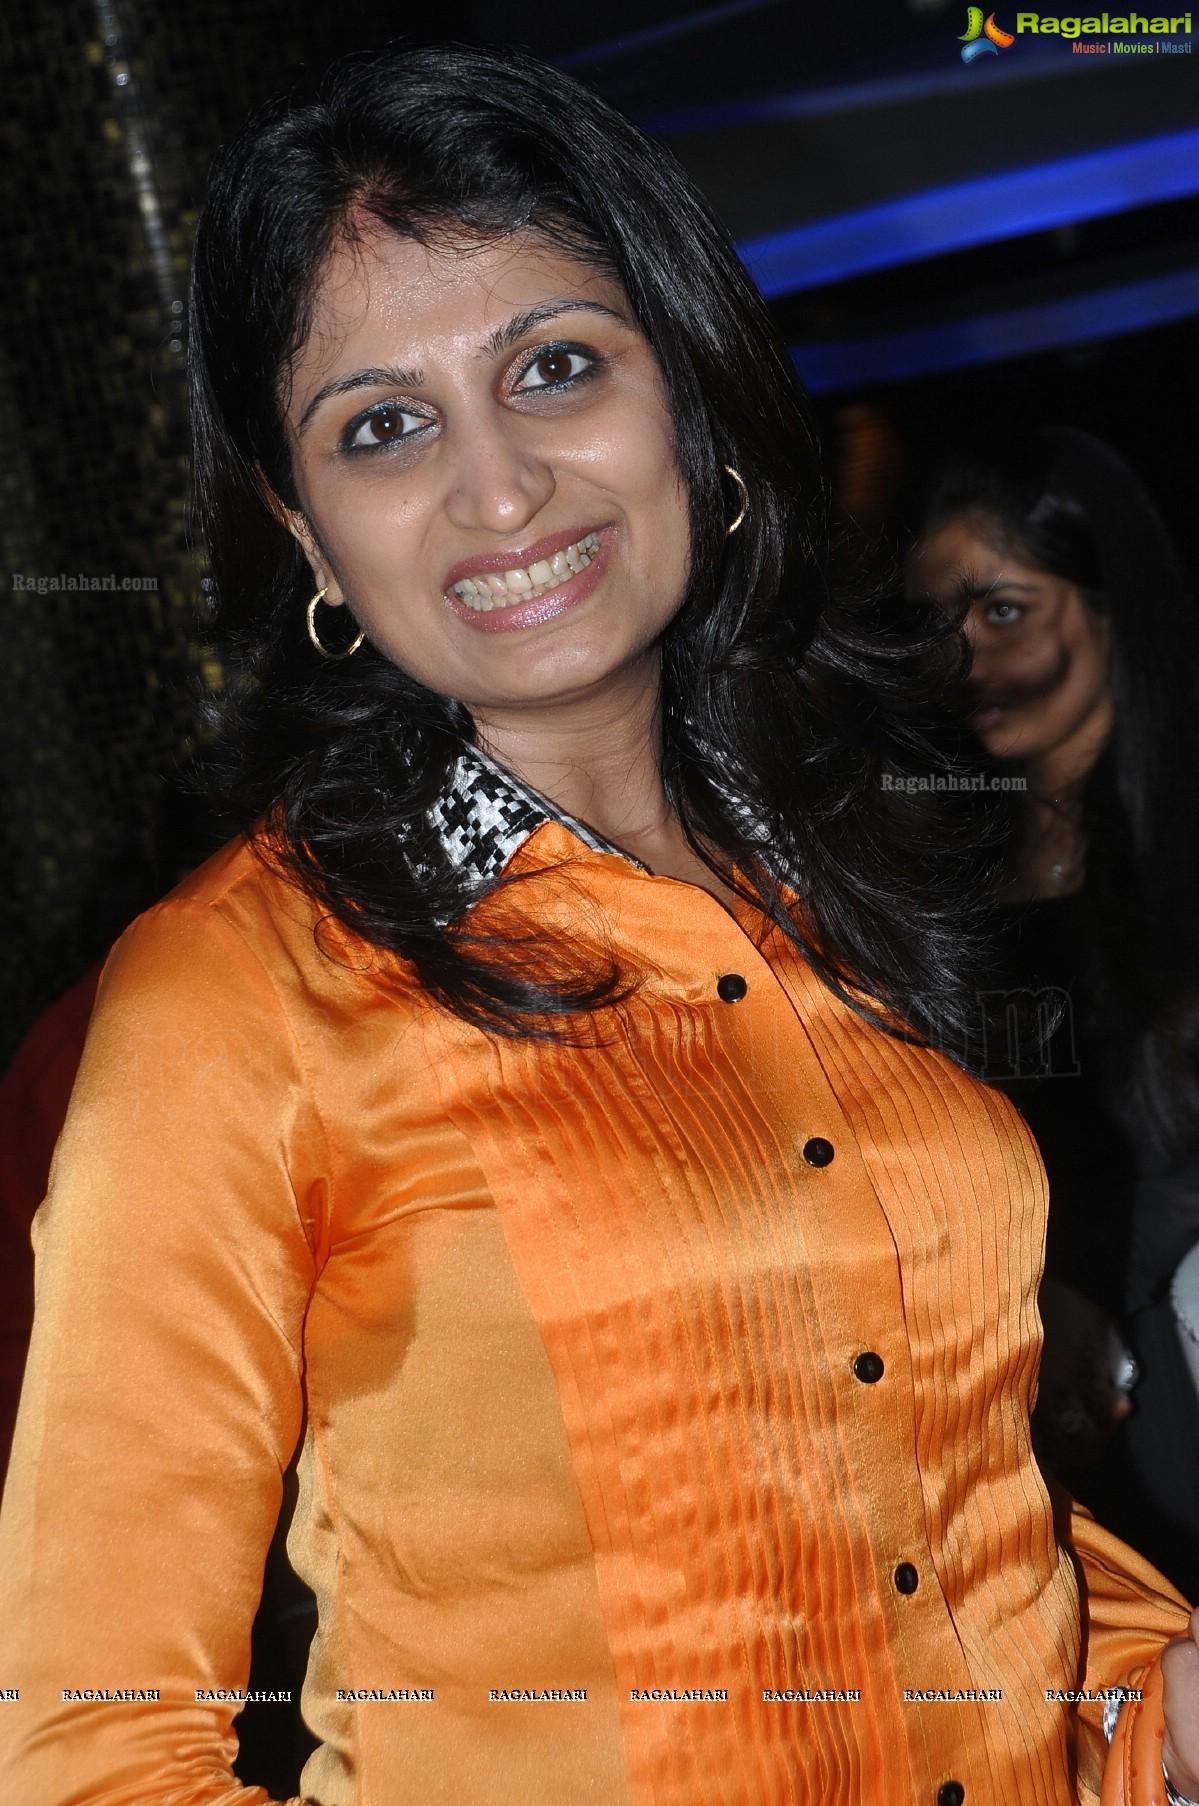 Indian Actresses Sweaty Armpits